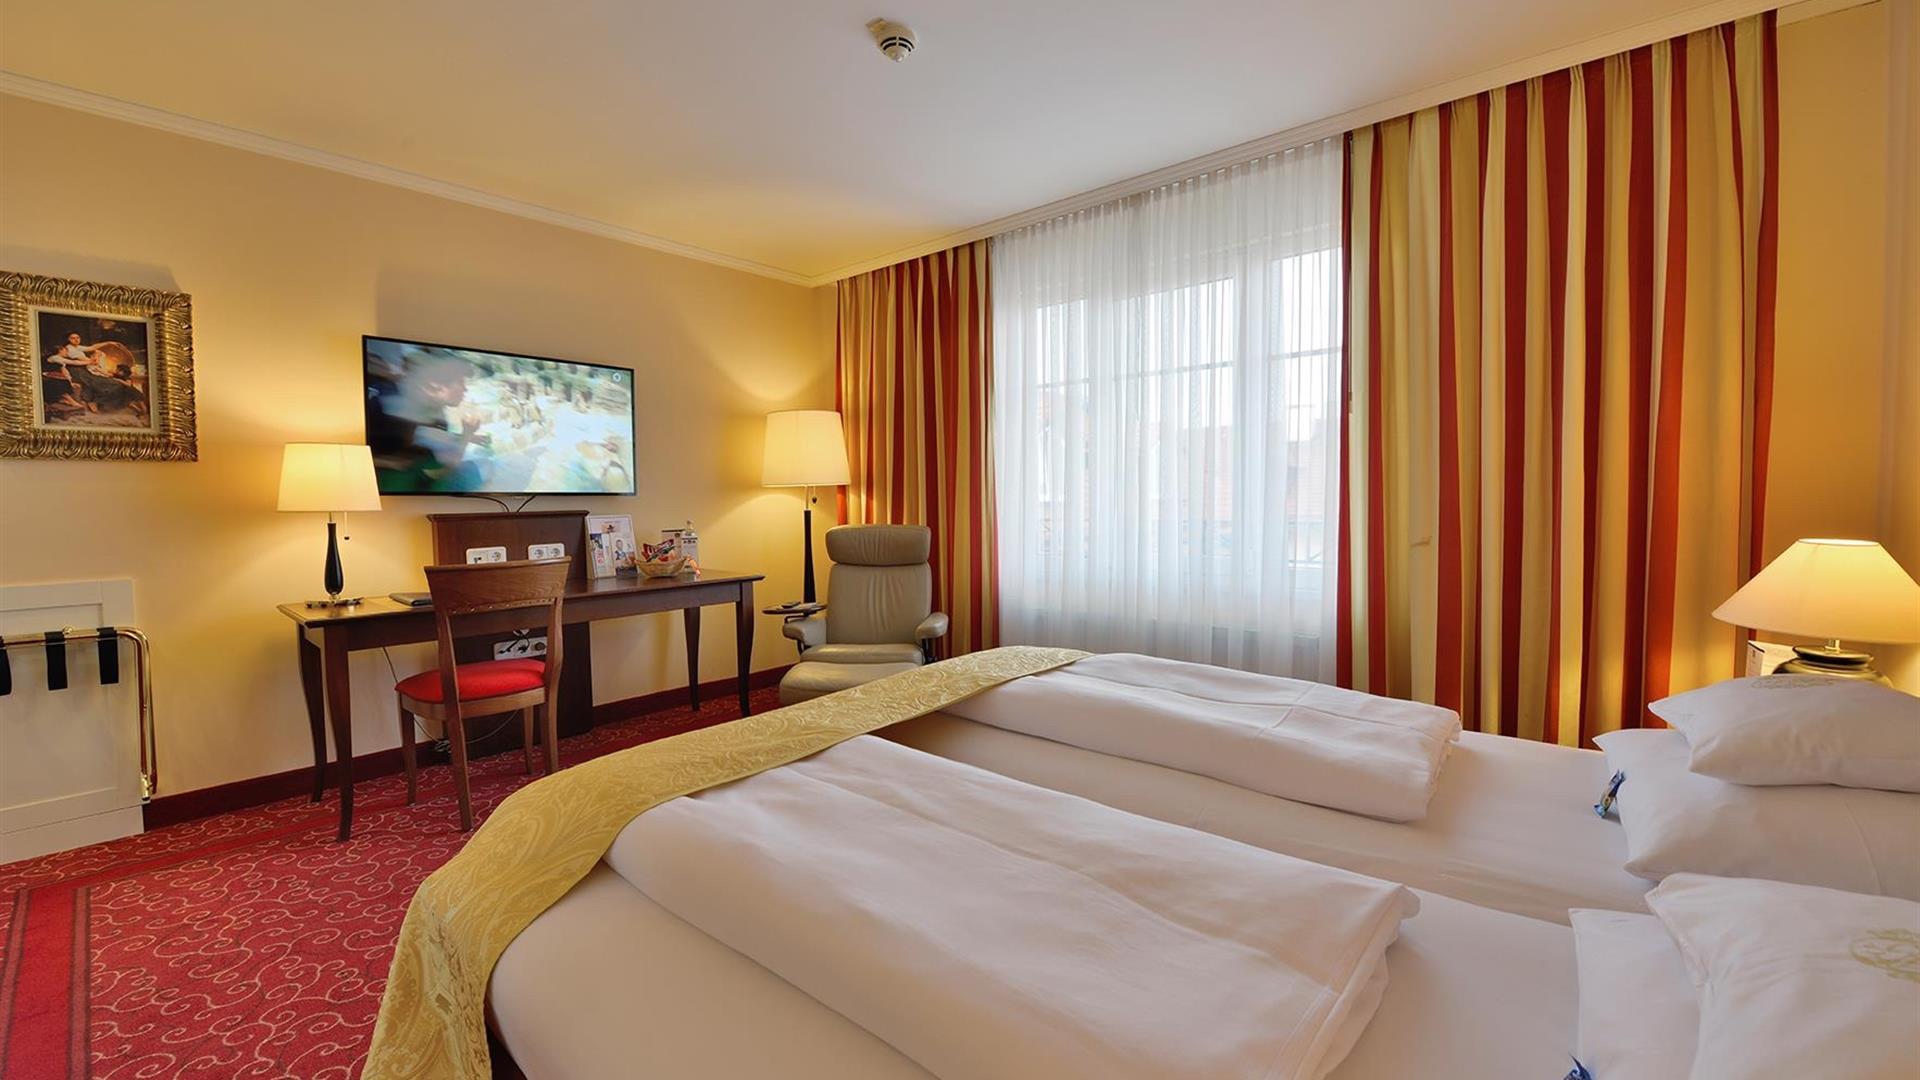 deluxe zimmer mit klimaanlage 4 sterne hotel erb parsdorf messe m nchen. Black Bedroom Furniture Sets. Home Design Ideas